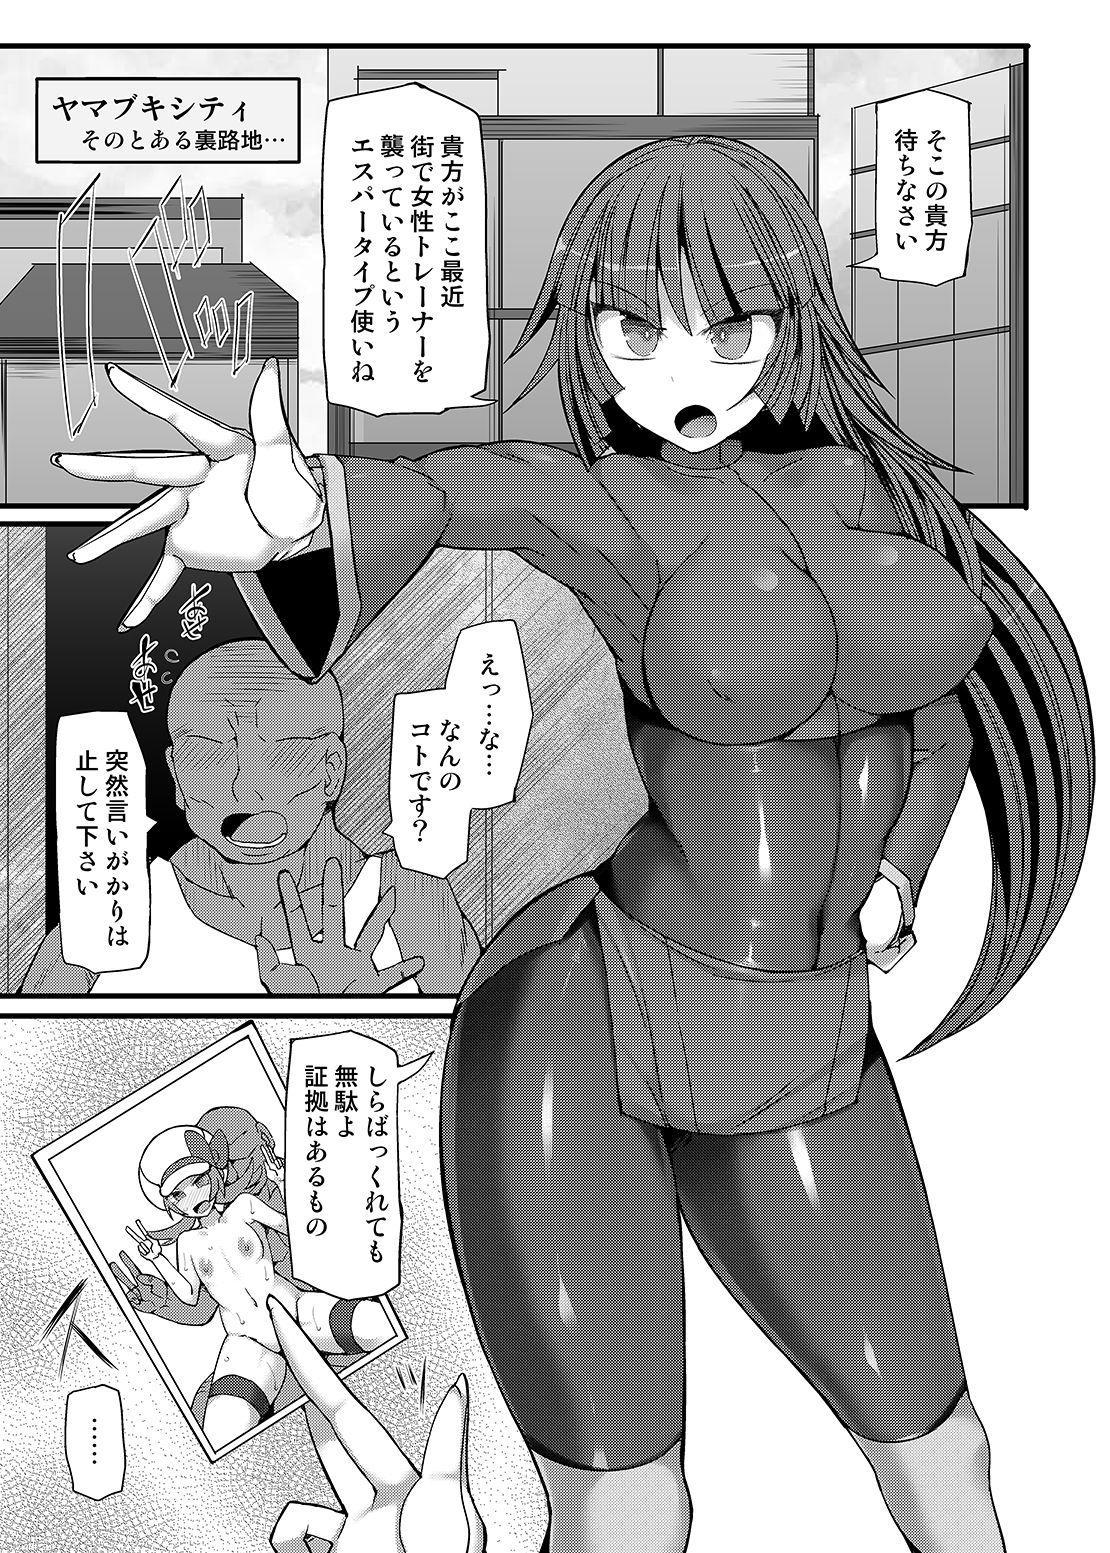 [Stapspats (Hisui)] Stapspats [Pocket Monster Saimin Series Soushuuhen] 1 Collective Hypnosis (Pokémon) [Digital] 77